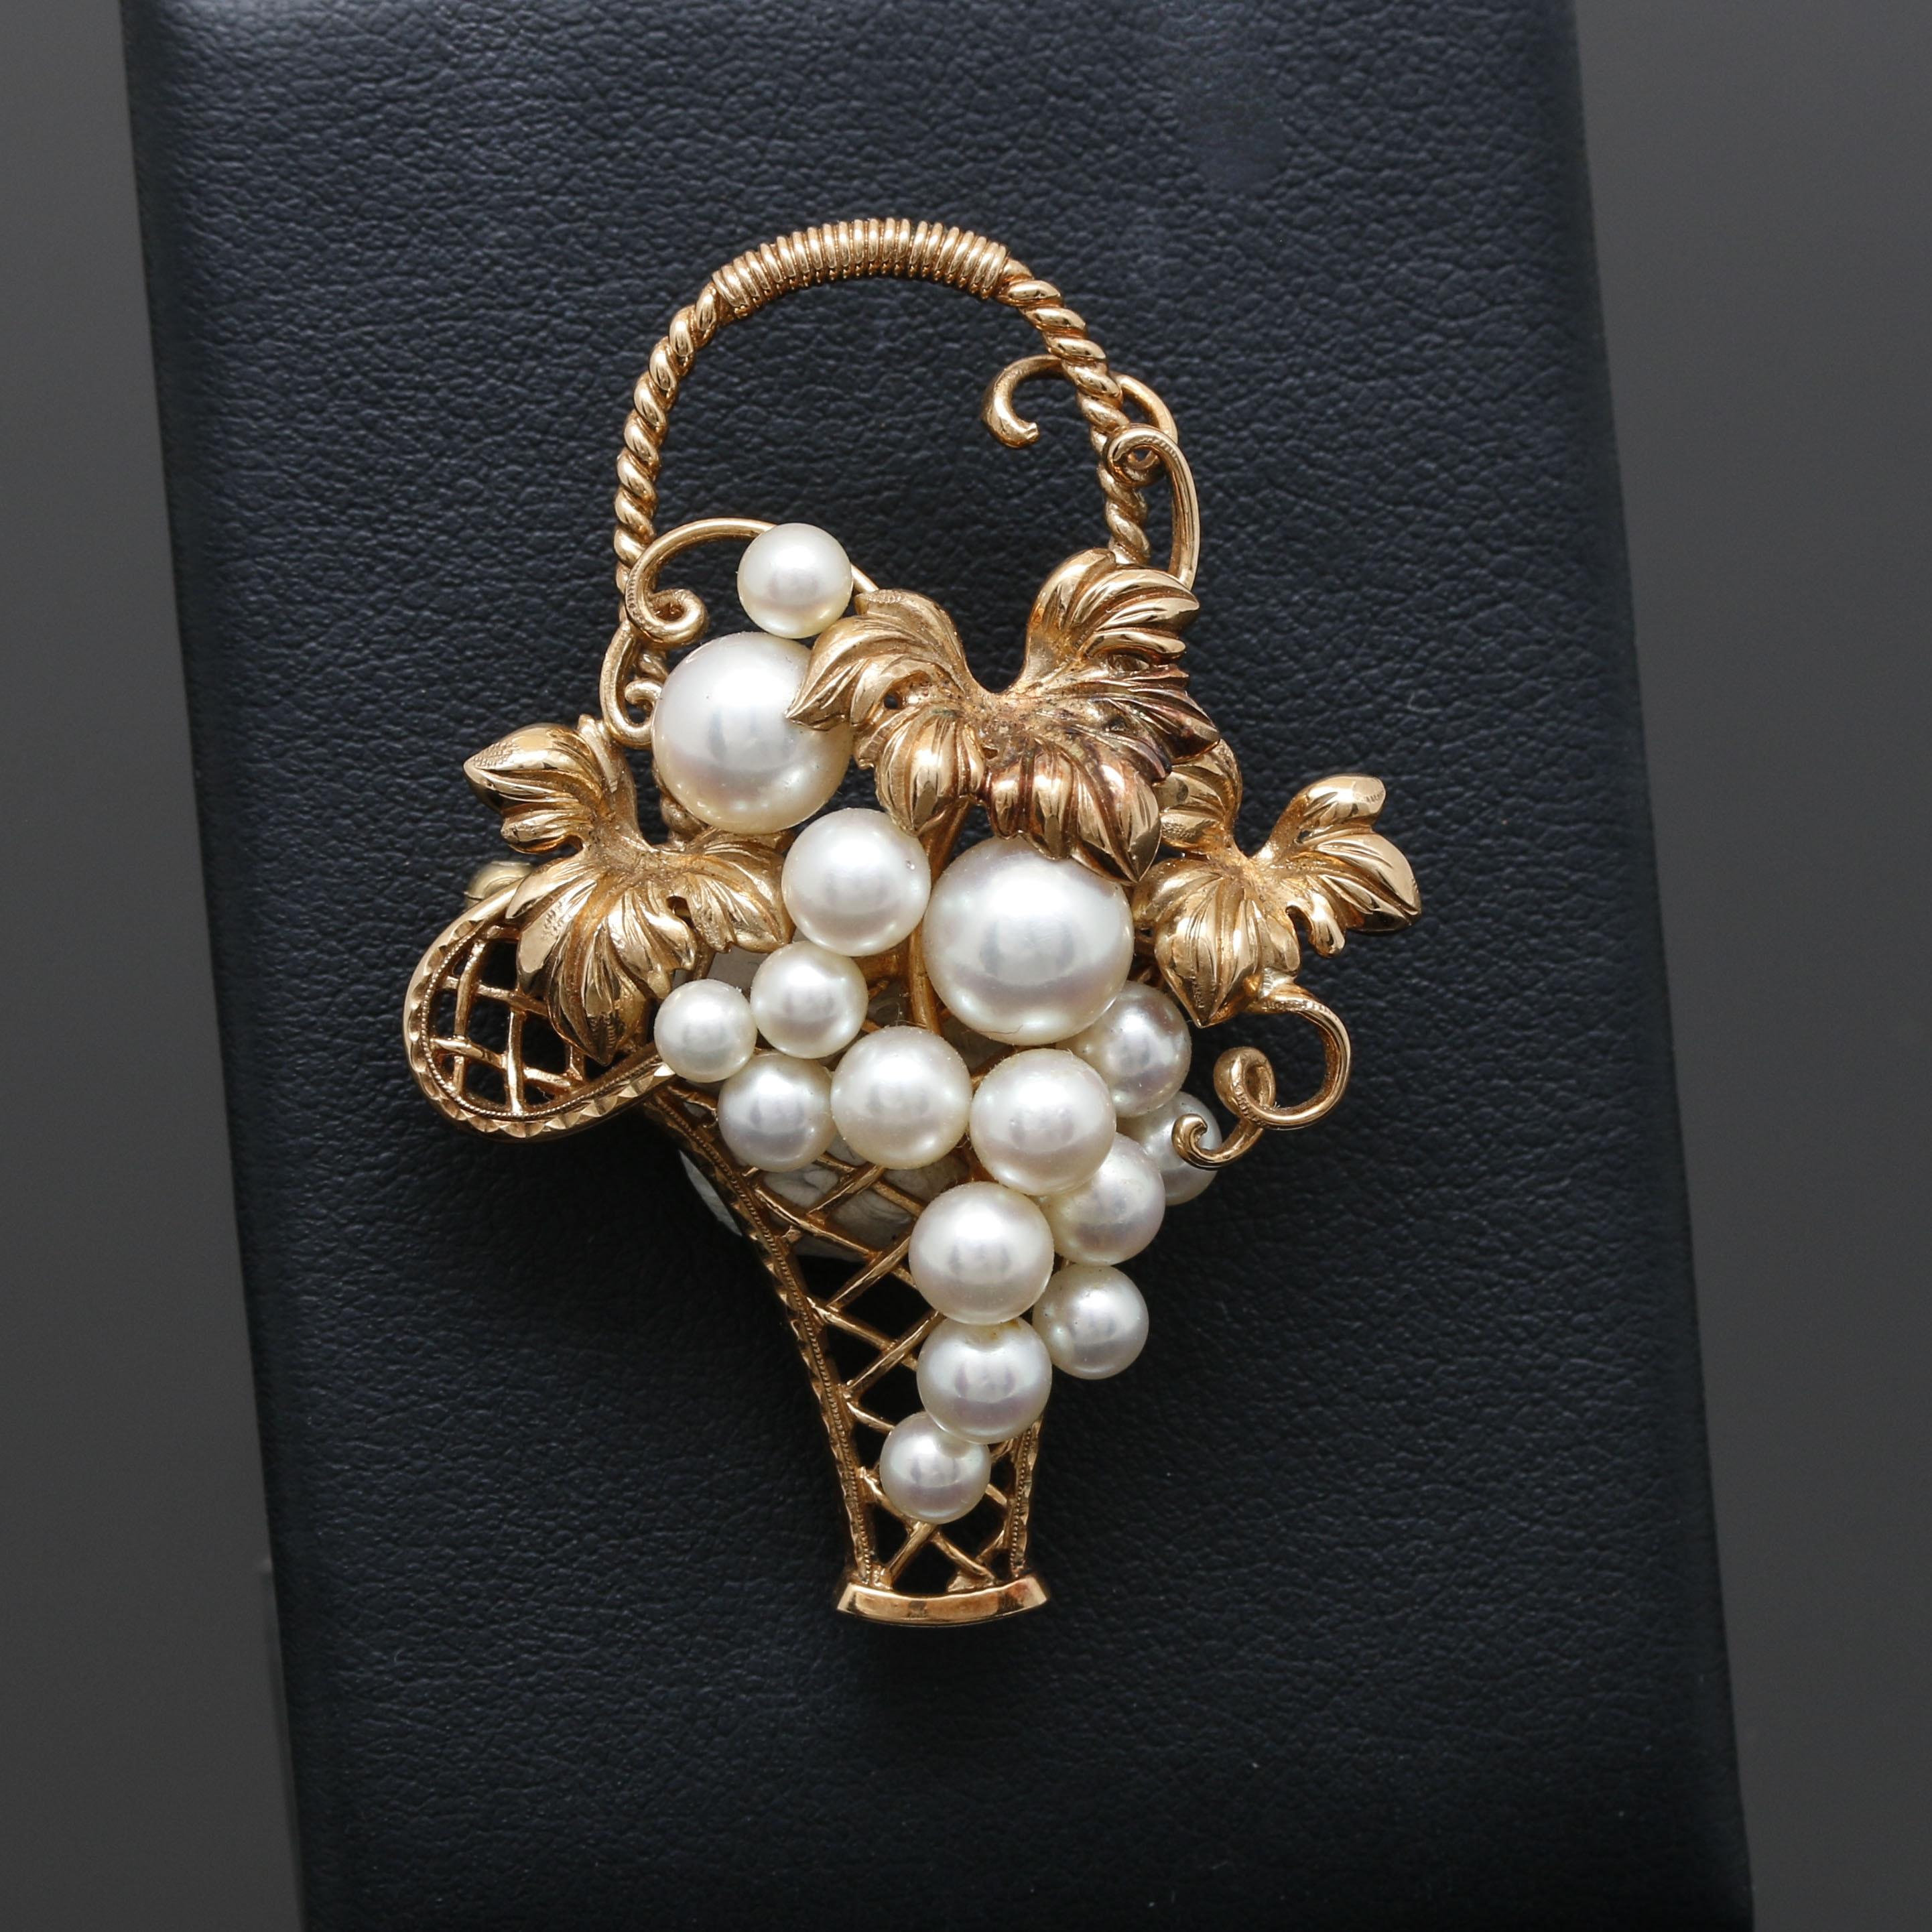 Mikimoto 14K Yellow Gold Cultured Pearl Foliate Basket Brooch